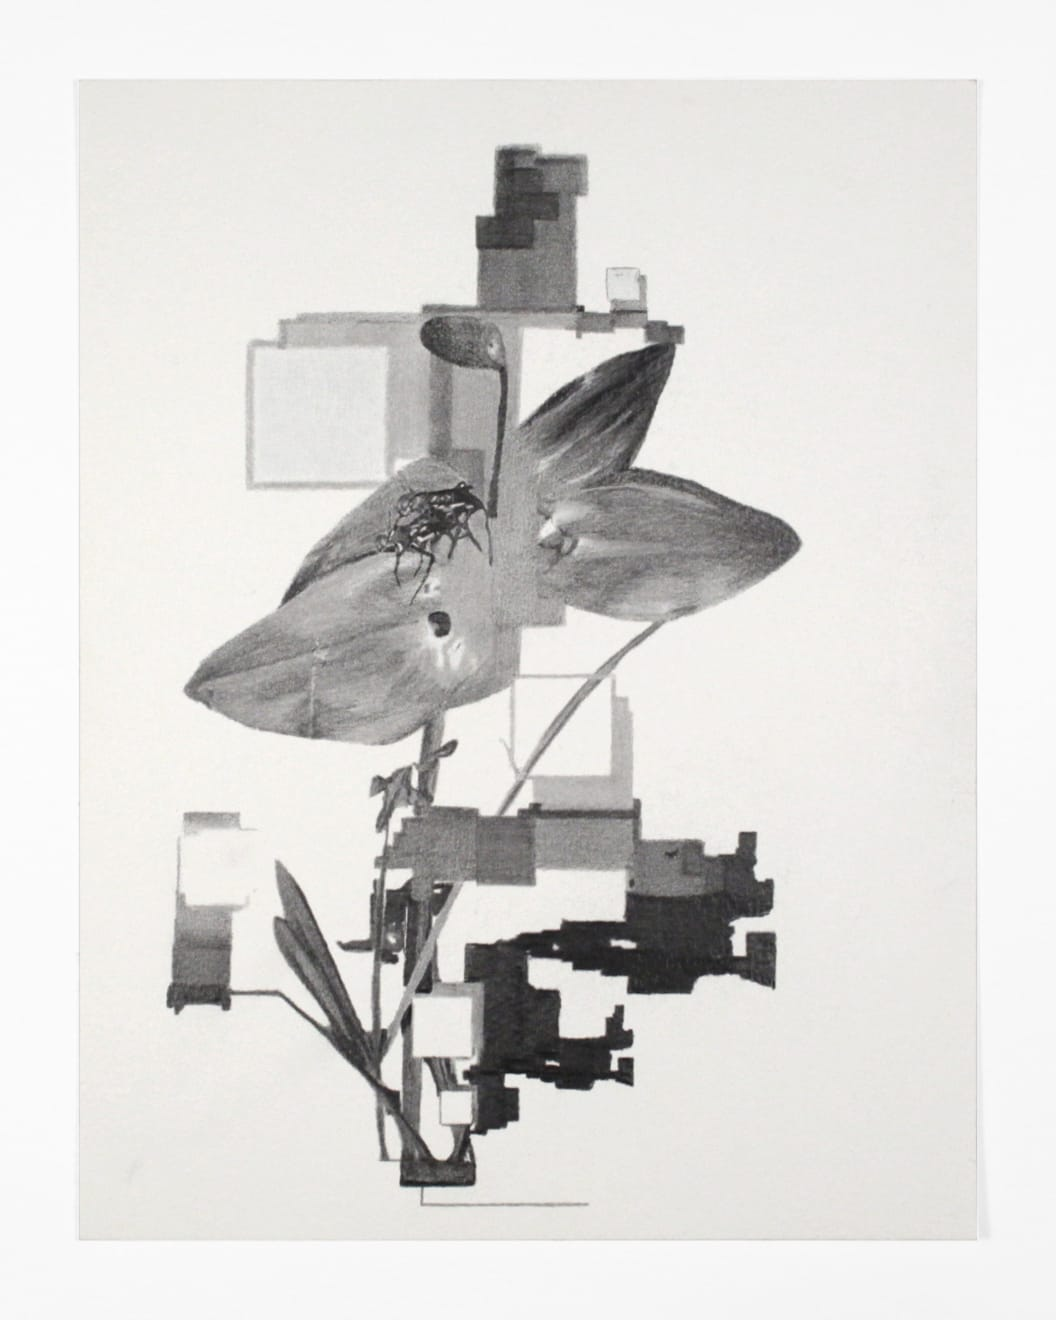 Robert Ruello Botanical_09, 2004 pencil on archival digital print on paper 11 x 8 1/2 in (27.9 x 21.6 cm) RR 116 $900